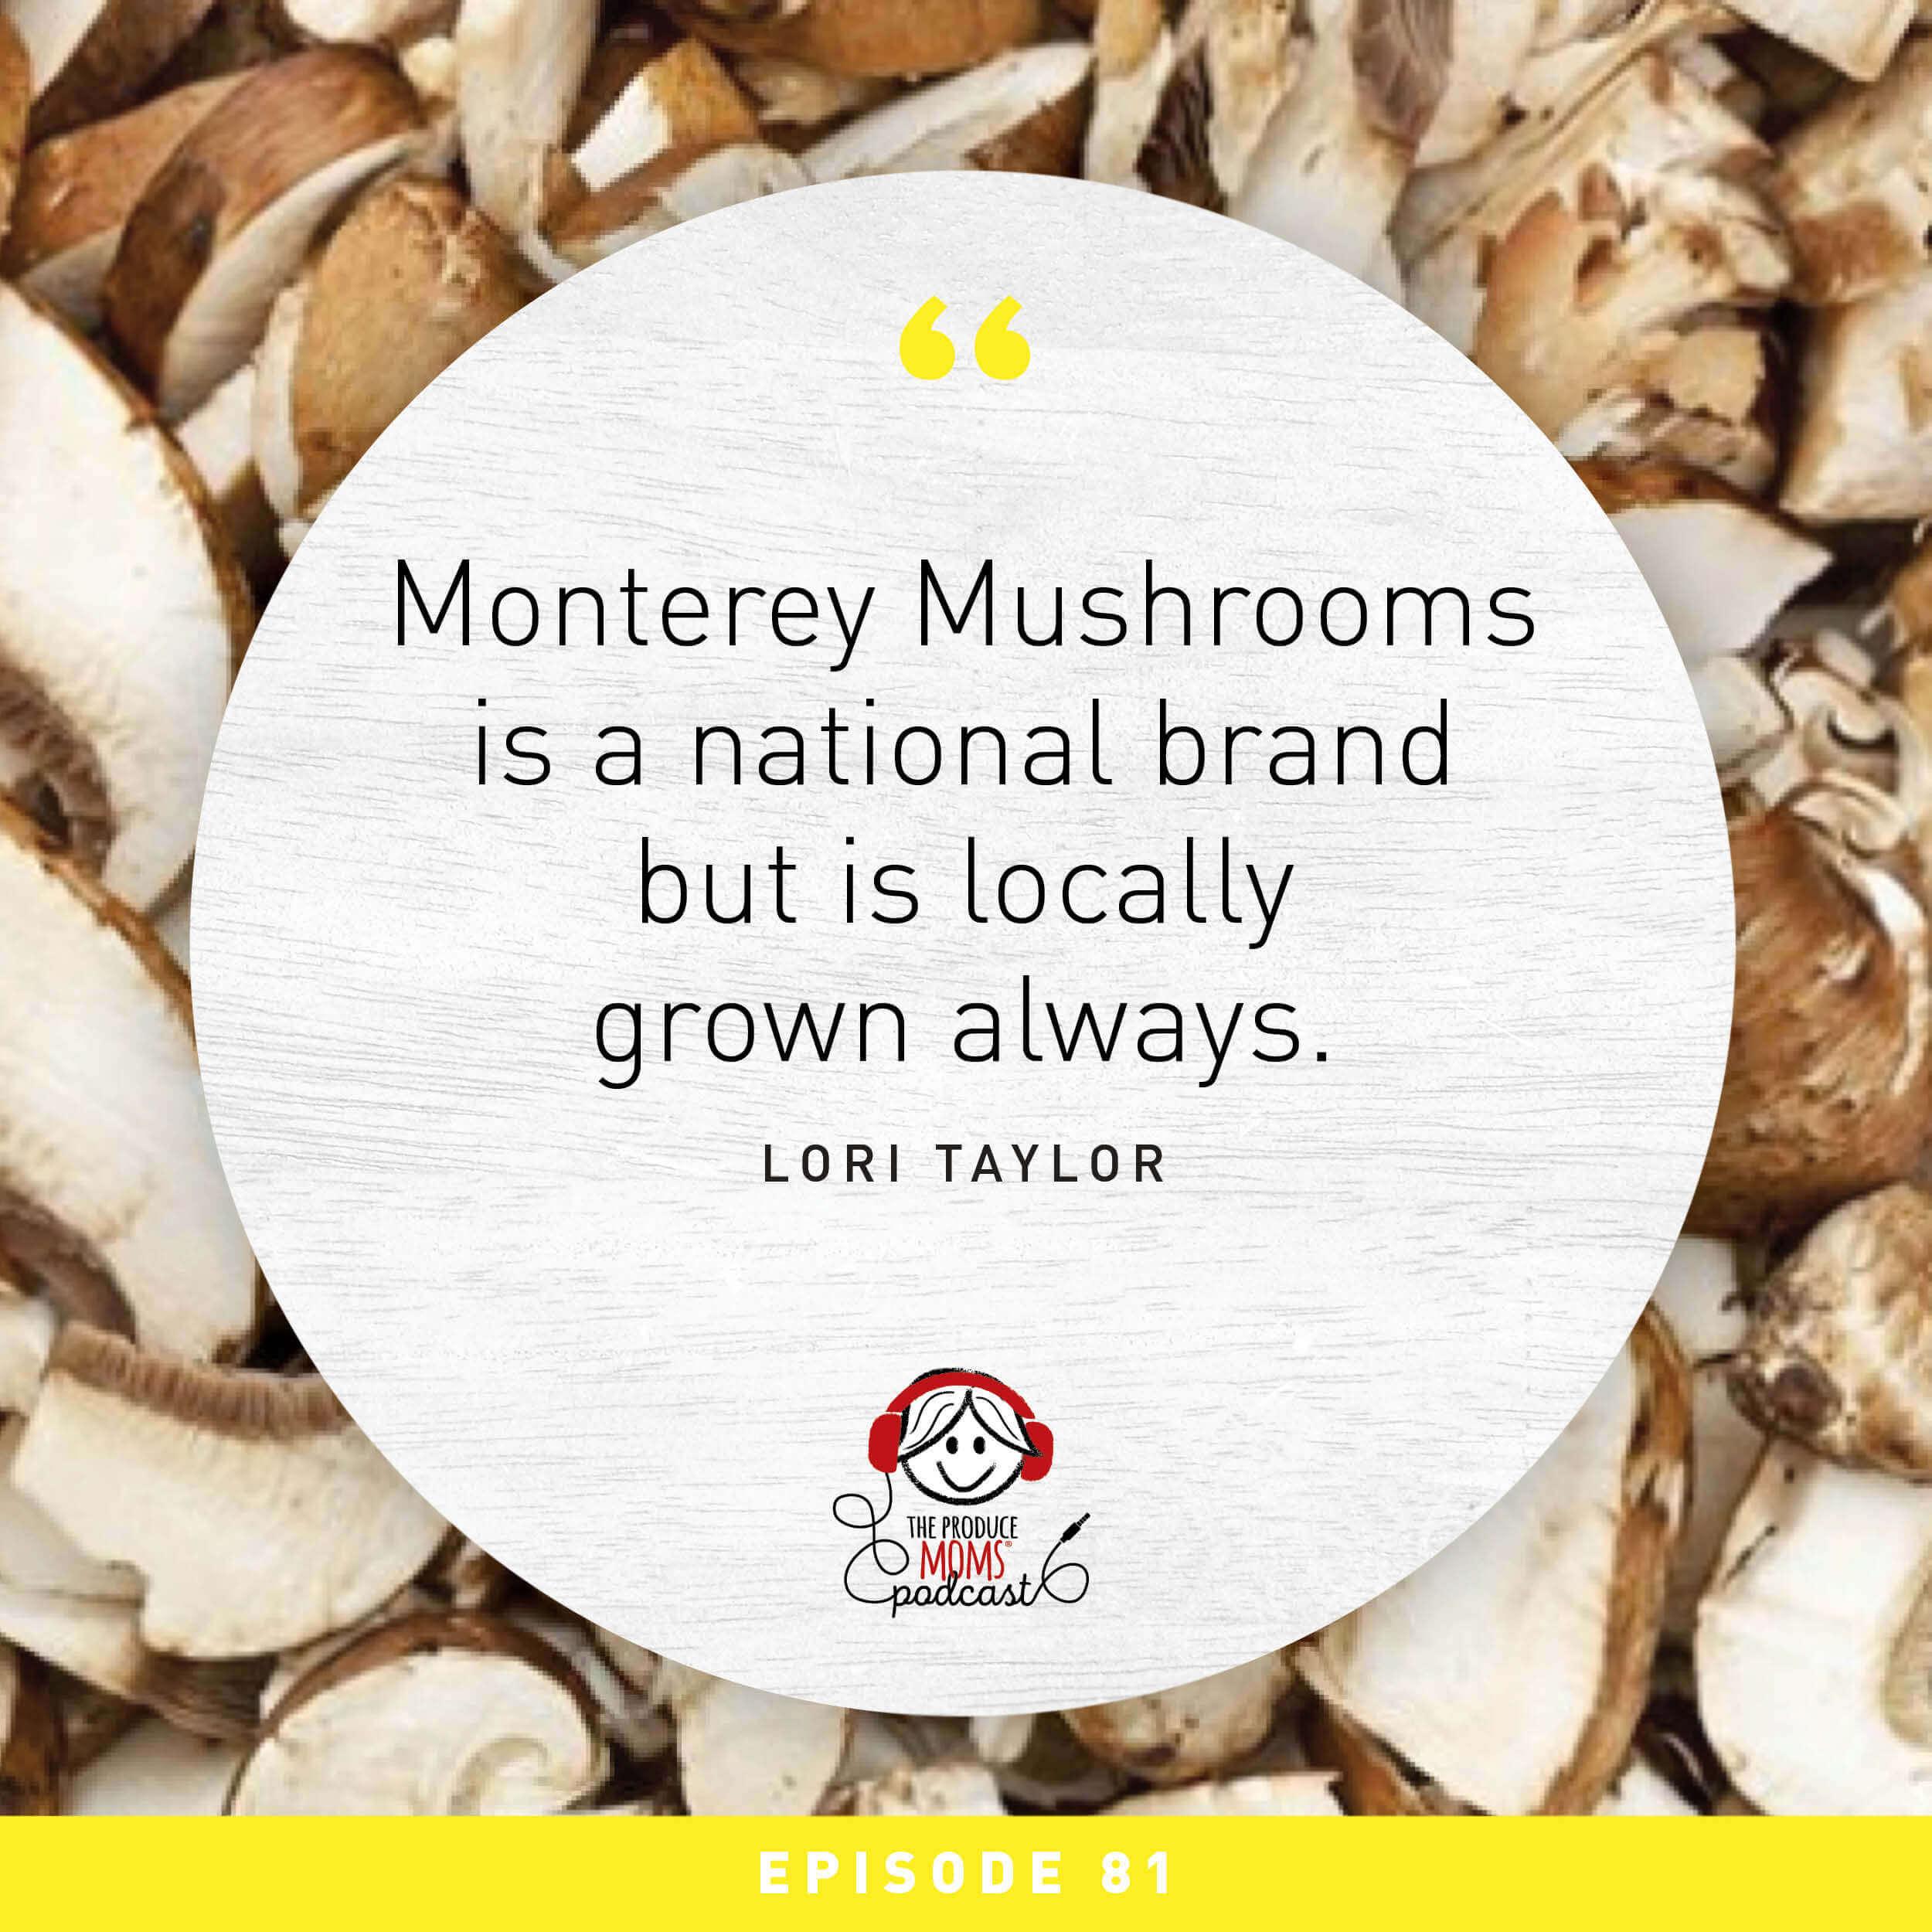 TPM podcast Monterey mushroom quote